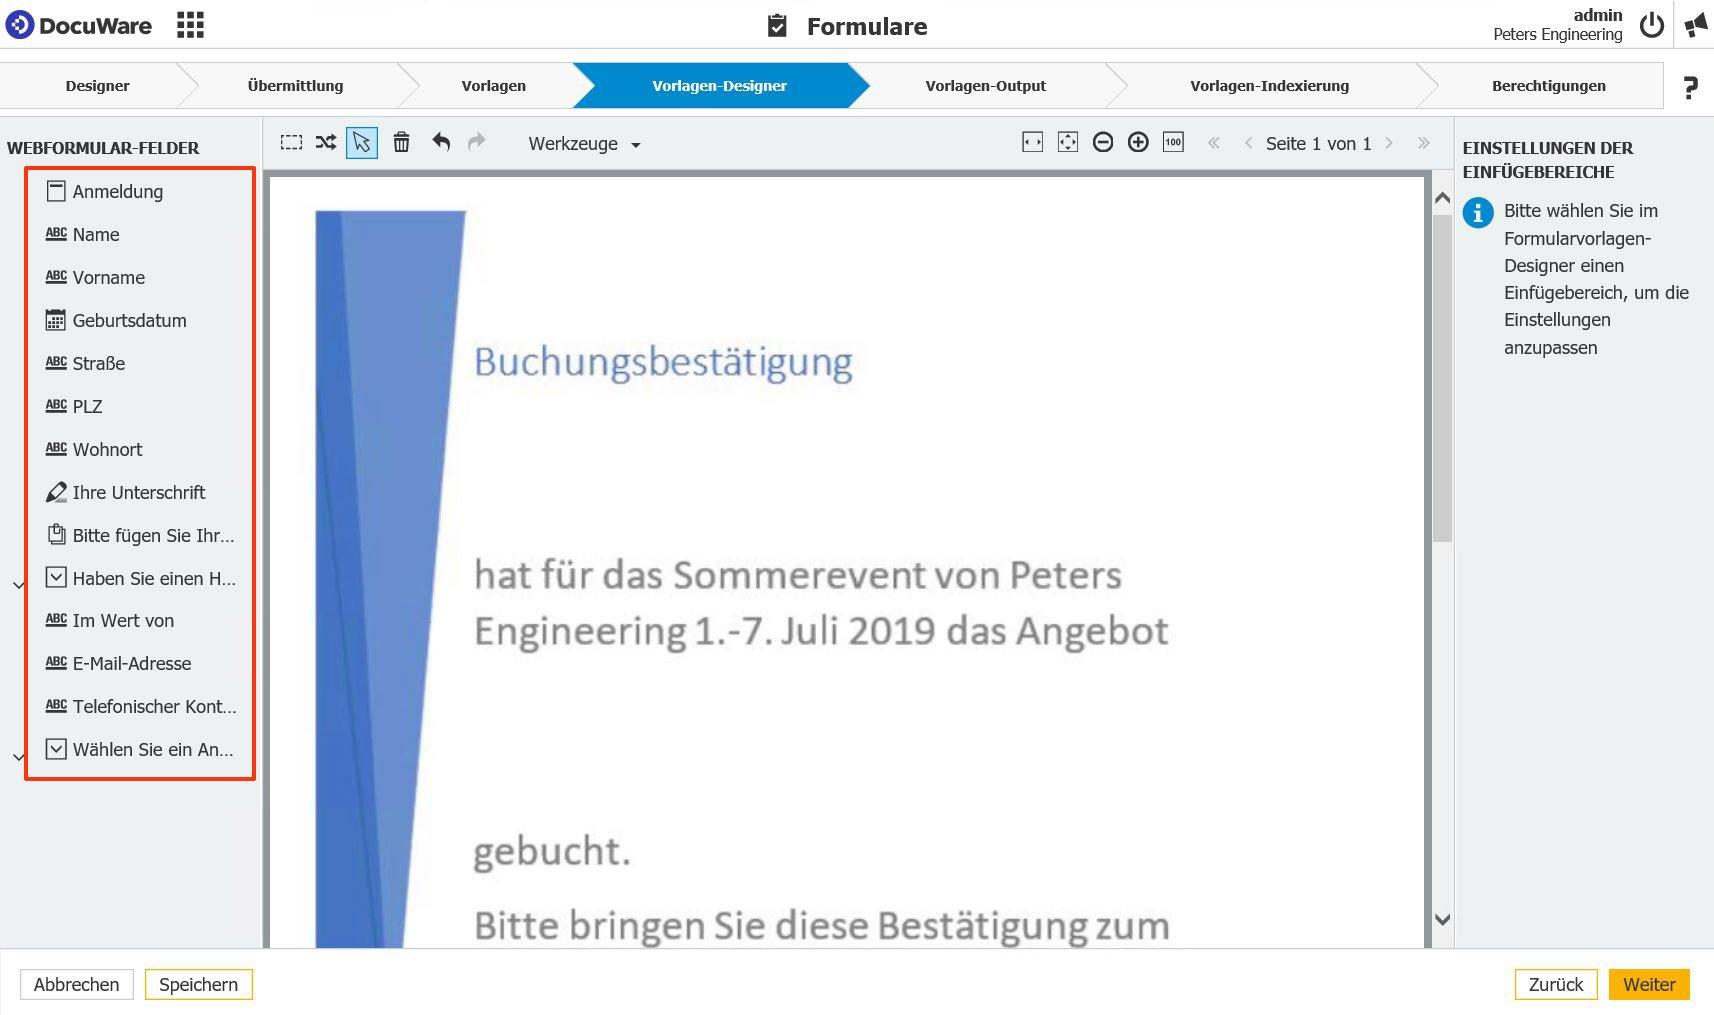 Formularvorlagen-Designer in DocuWare